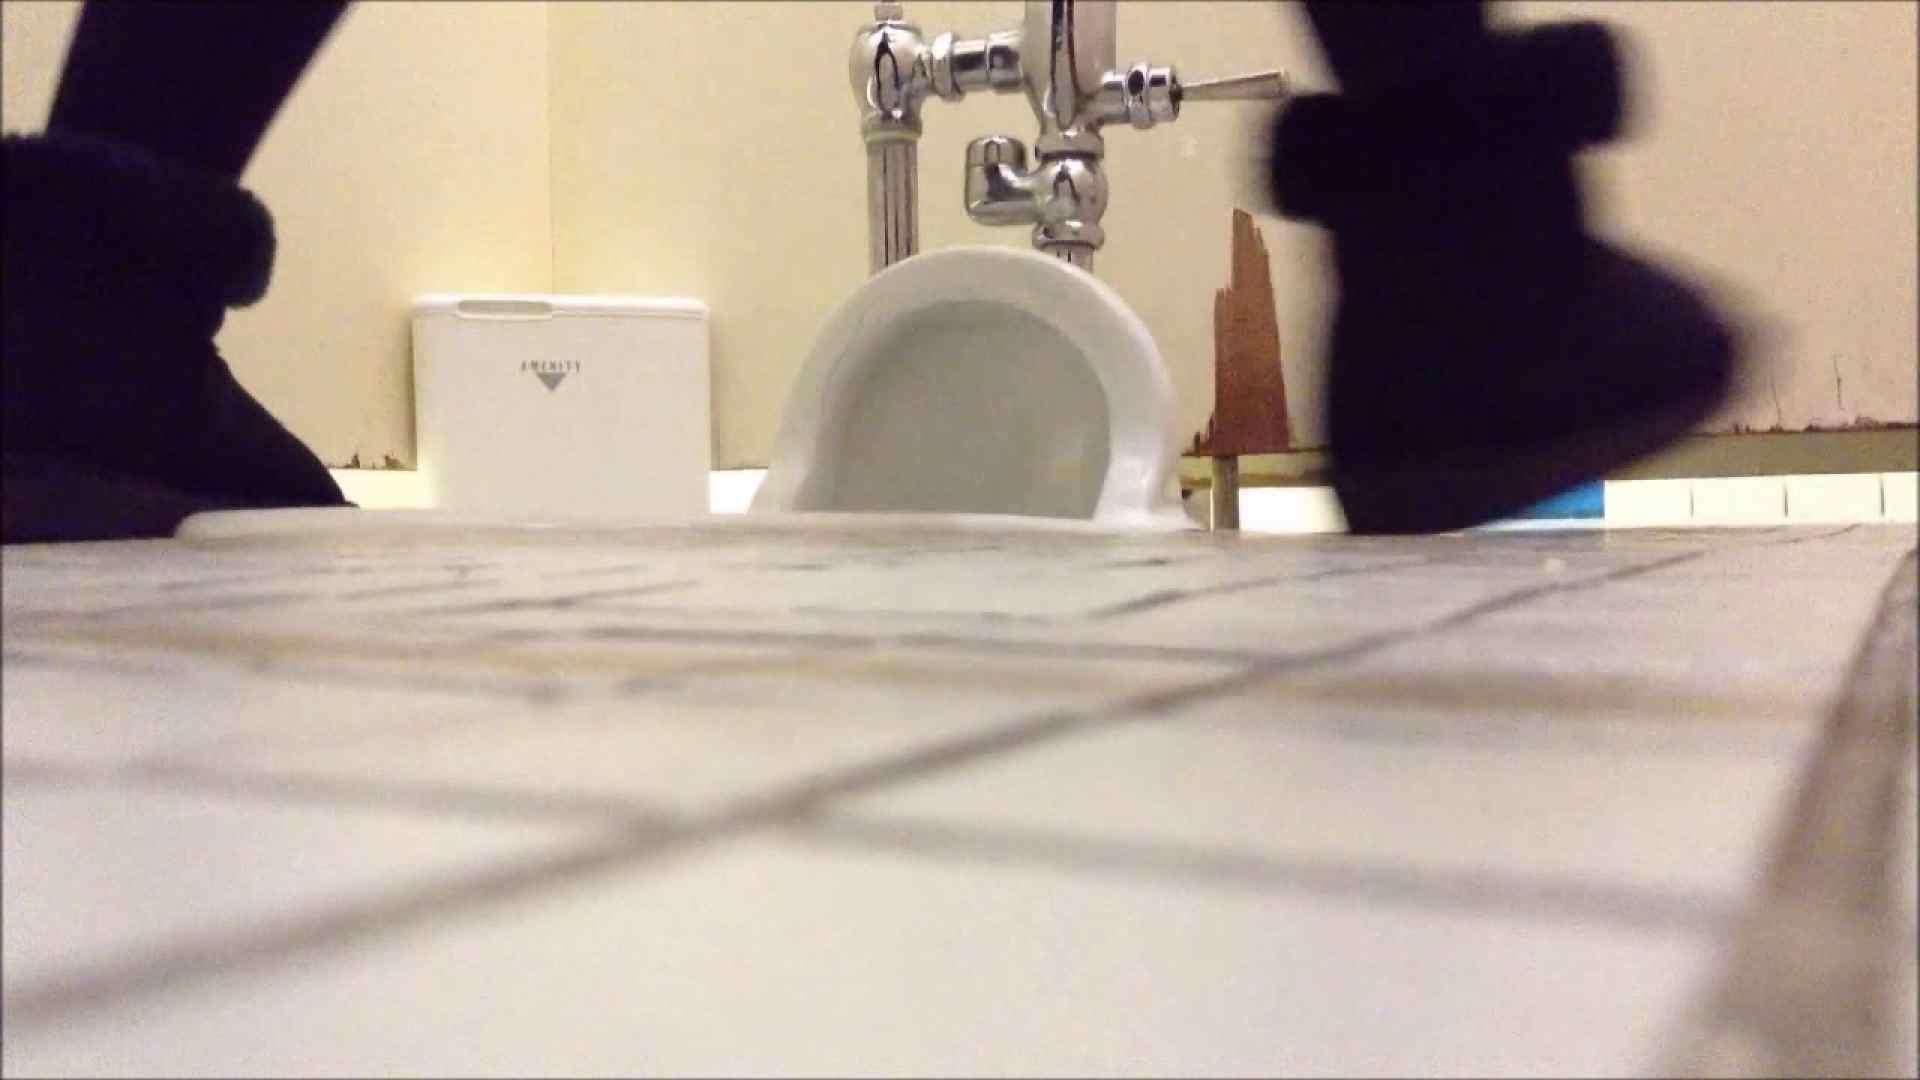 某有名大学女性洗面所 vol.01 和式 すけべAV動画紹介 80pic 10